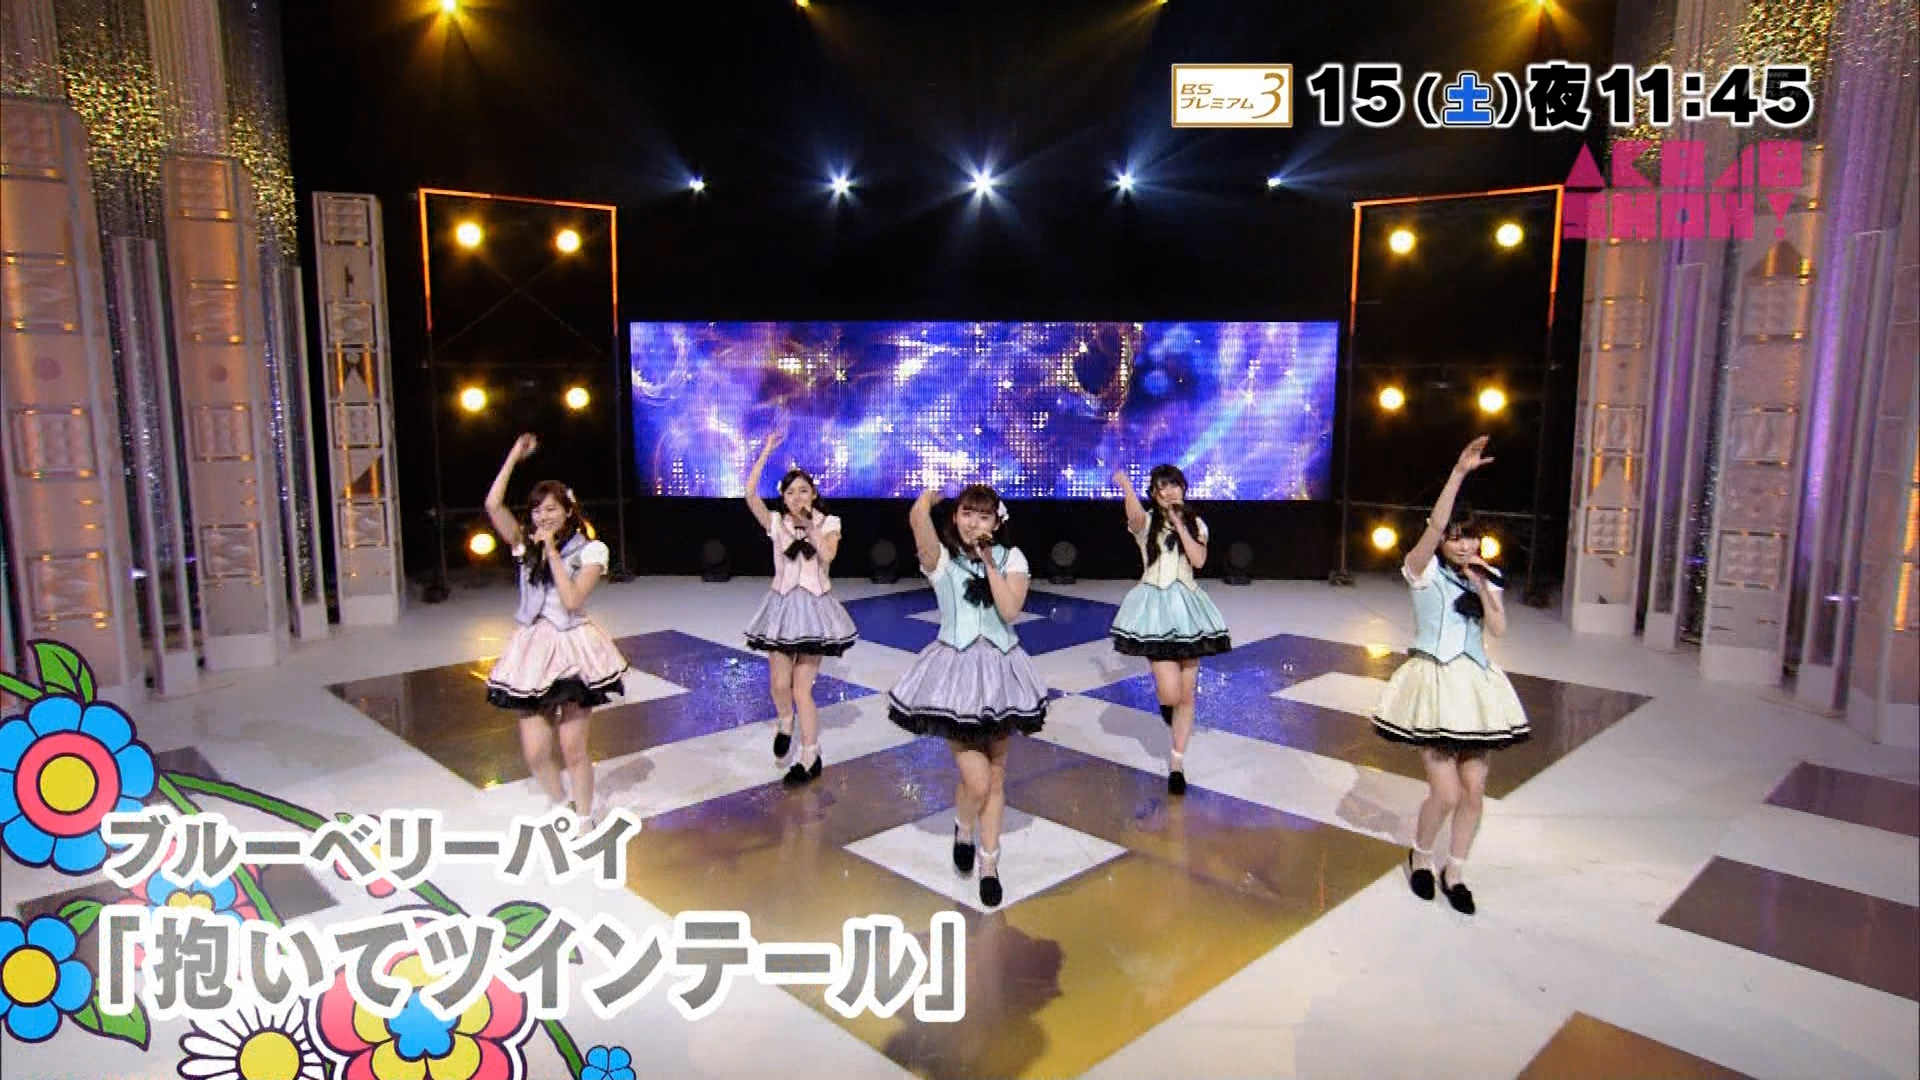 【HKT48】ブルーベリーパイ応援スレ★1.1【ユニット】YouTube動画>5本 ->画像>500枚